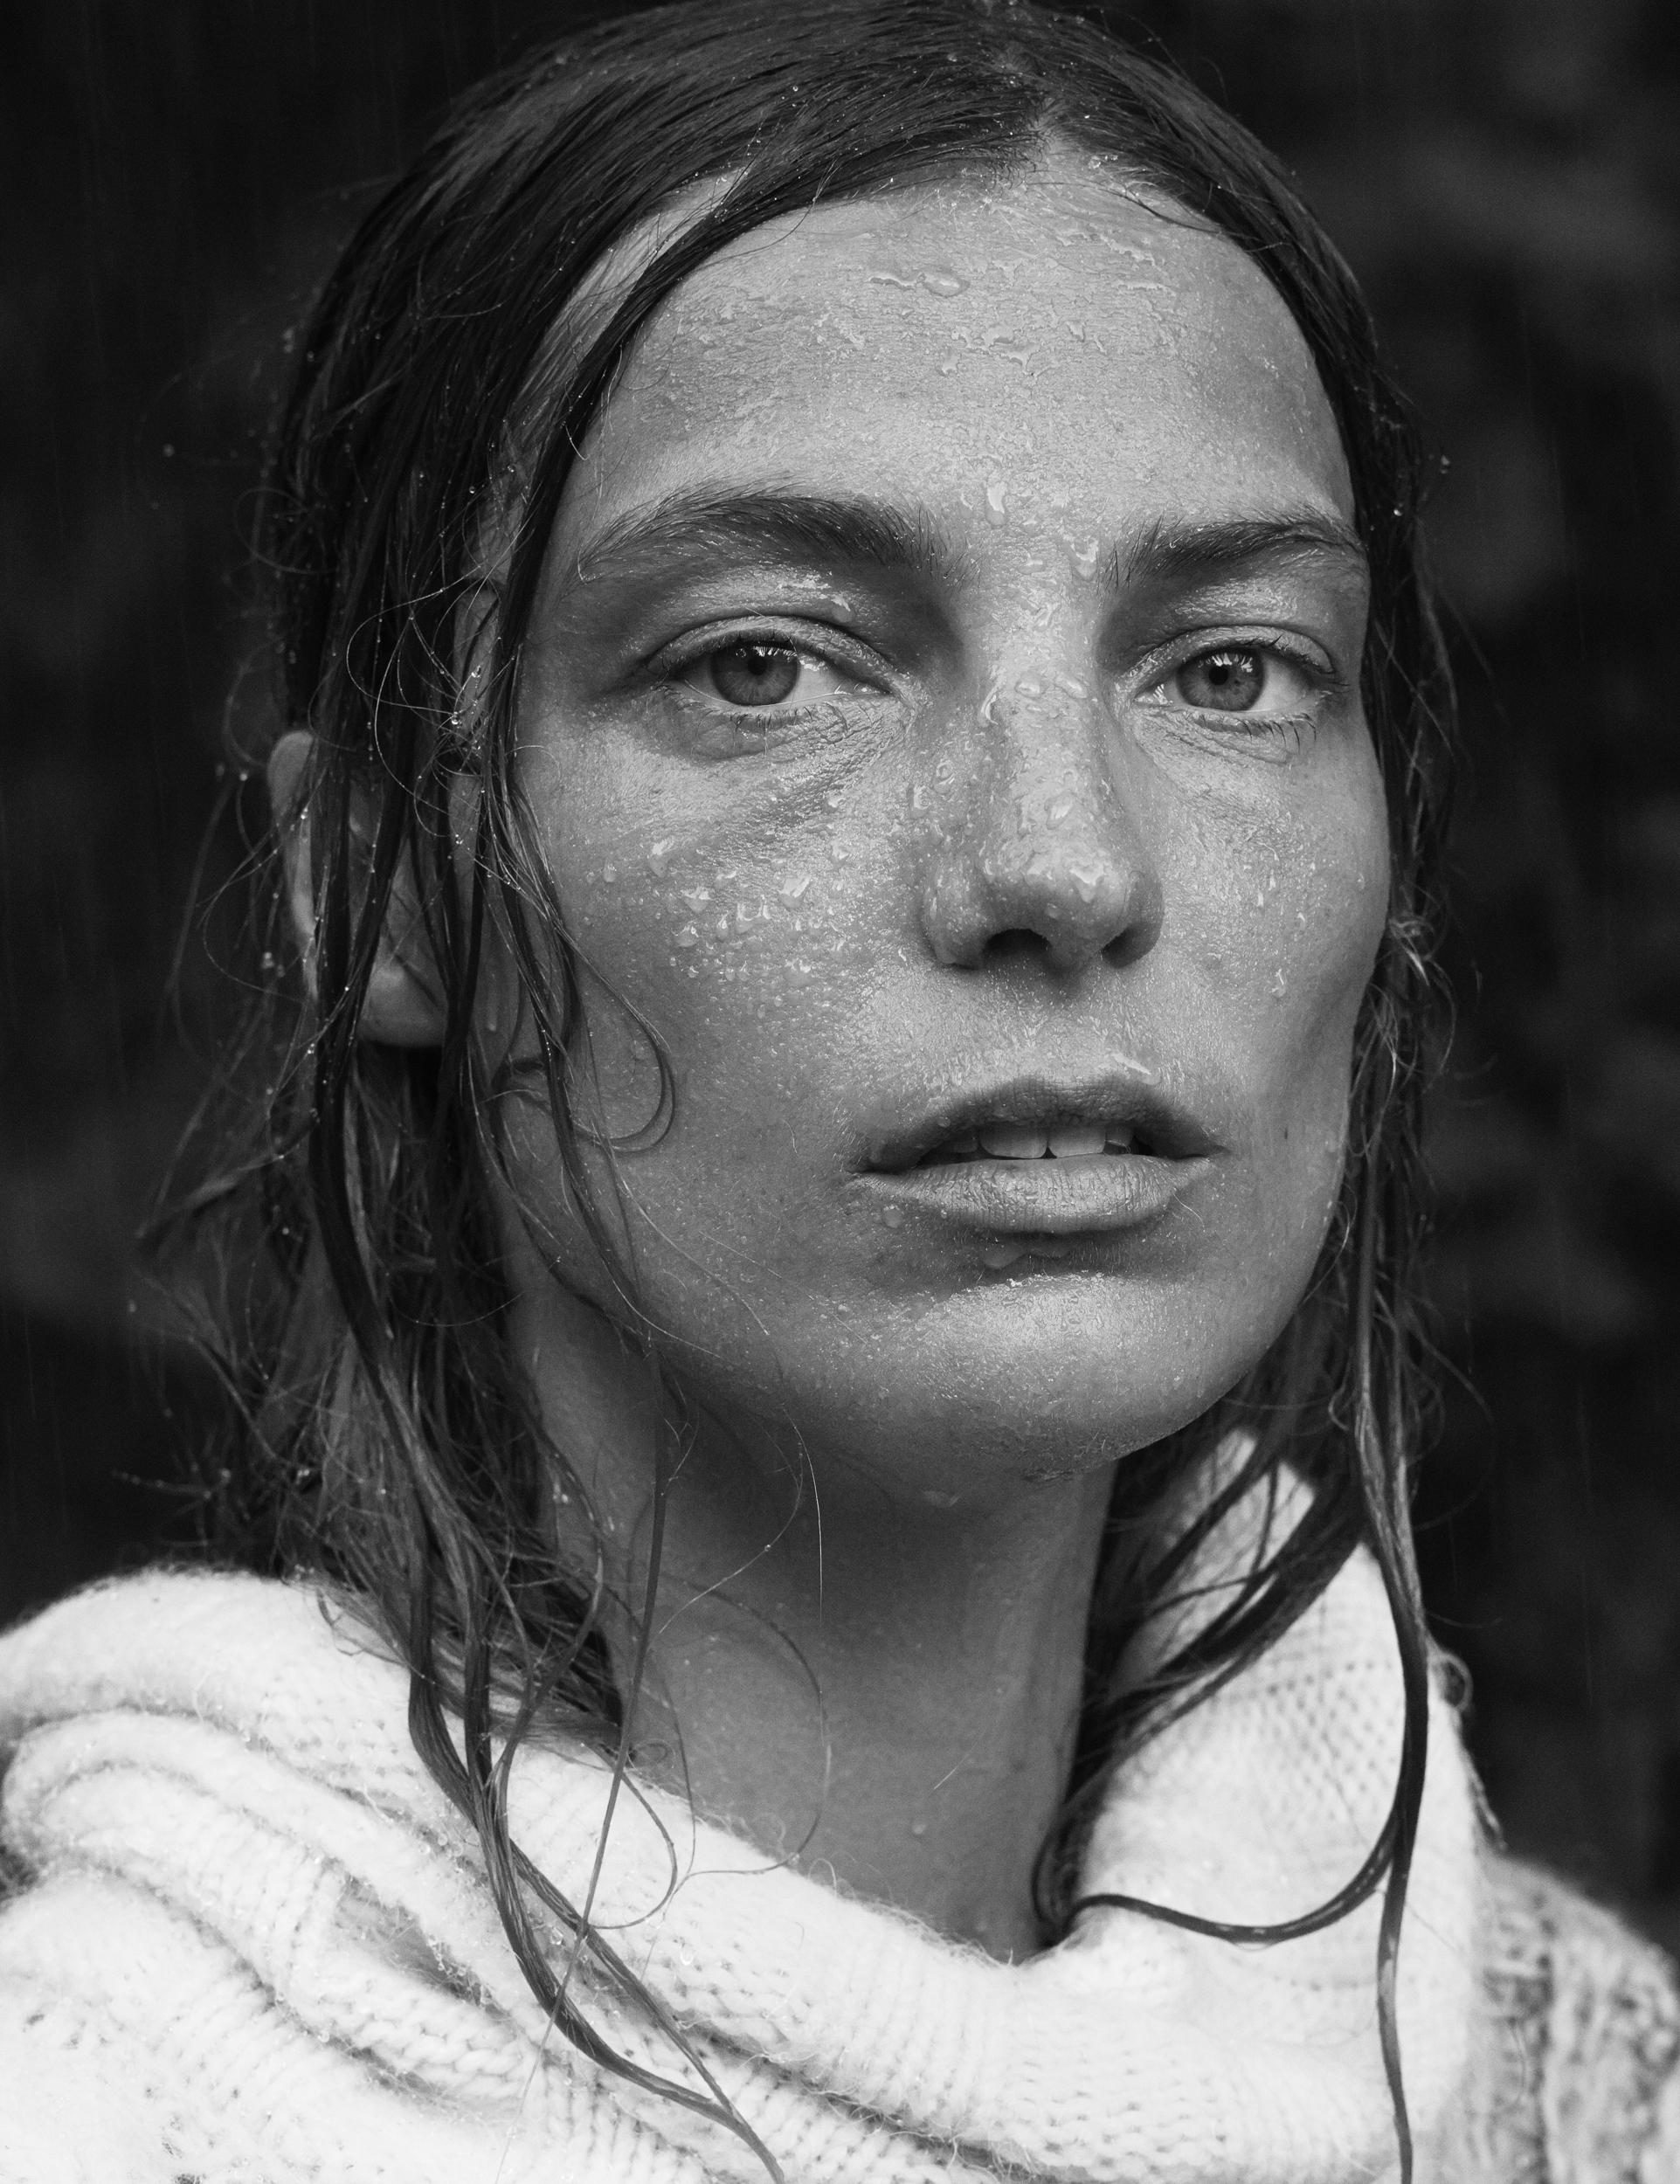 Daria, The Archipelago series # 19.  Sweden, 2014. Silvergelatin mounted on aluminum.